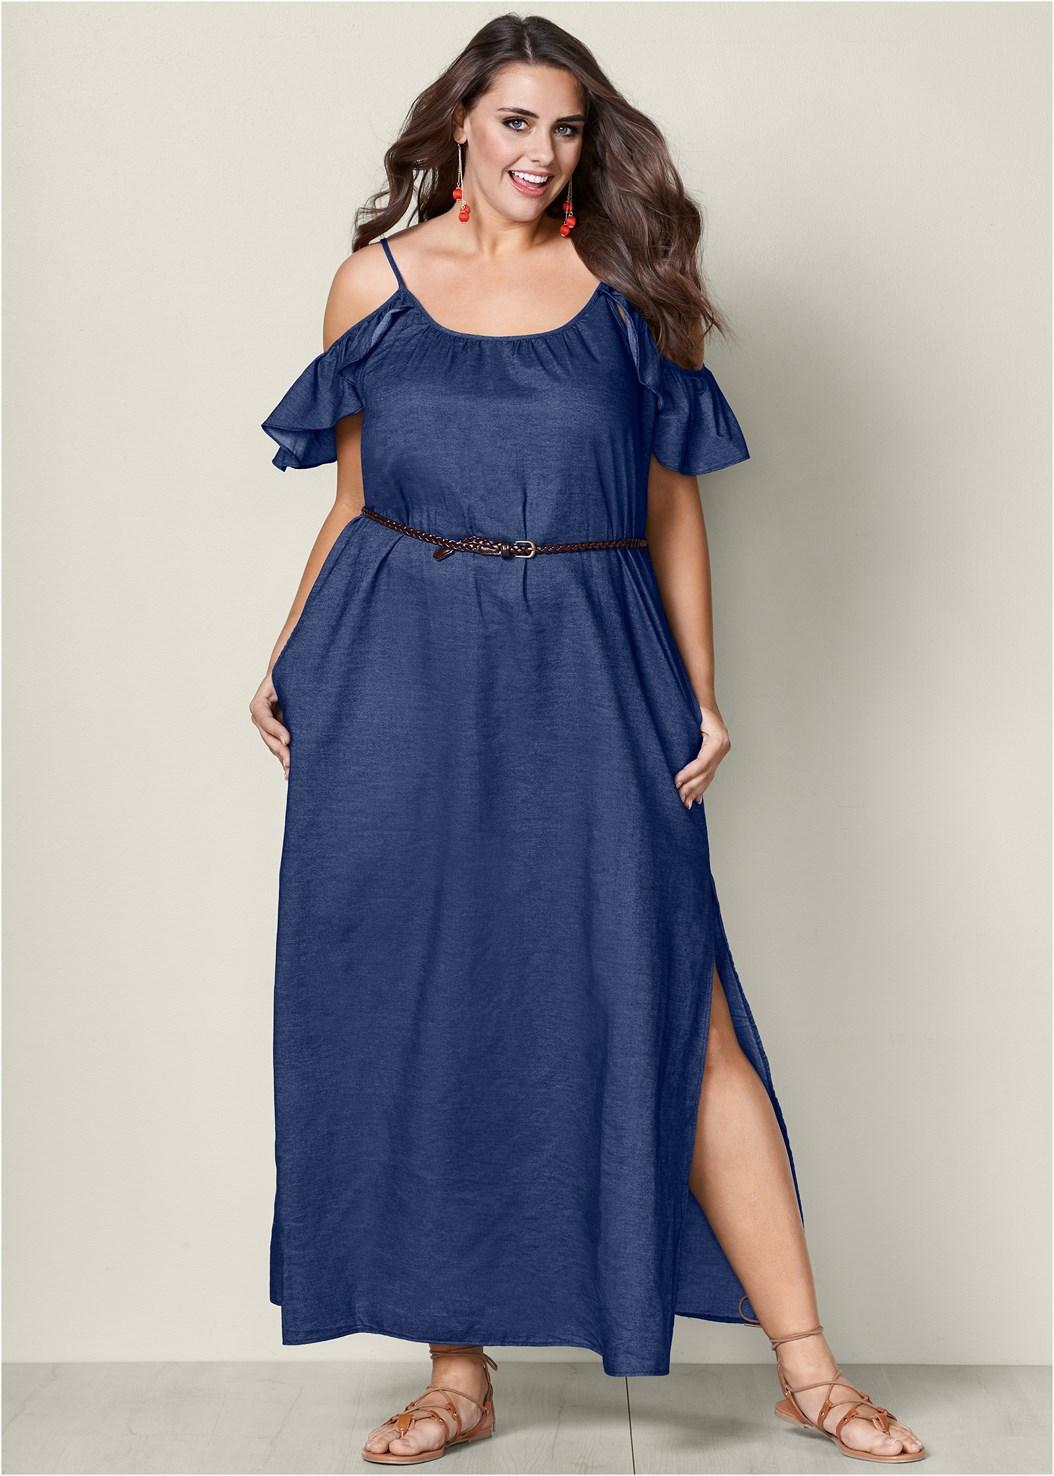 Venus Chambray Dress